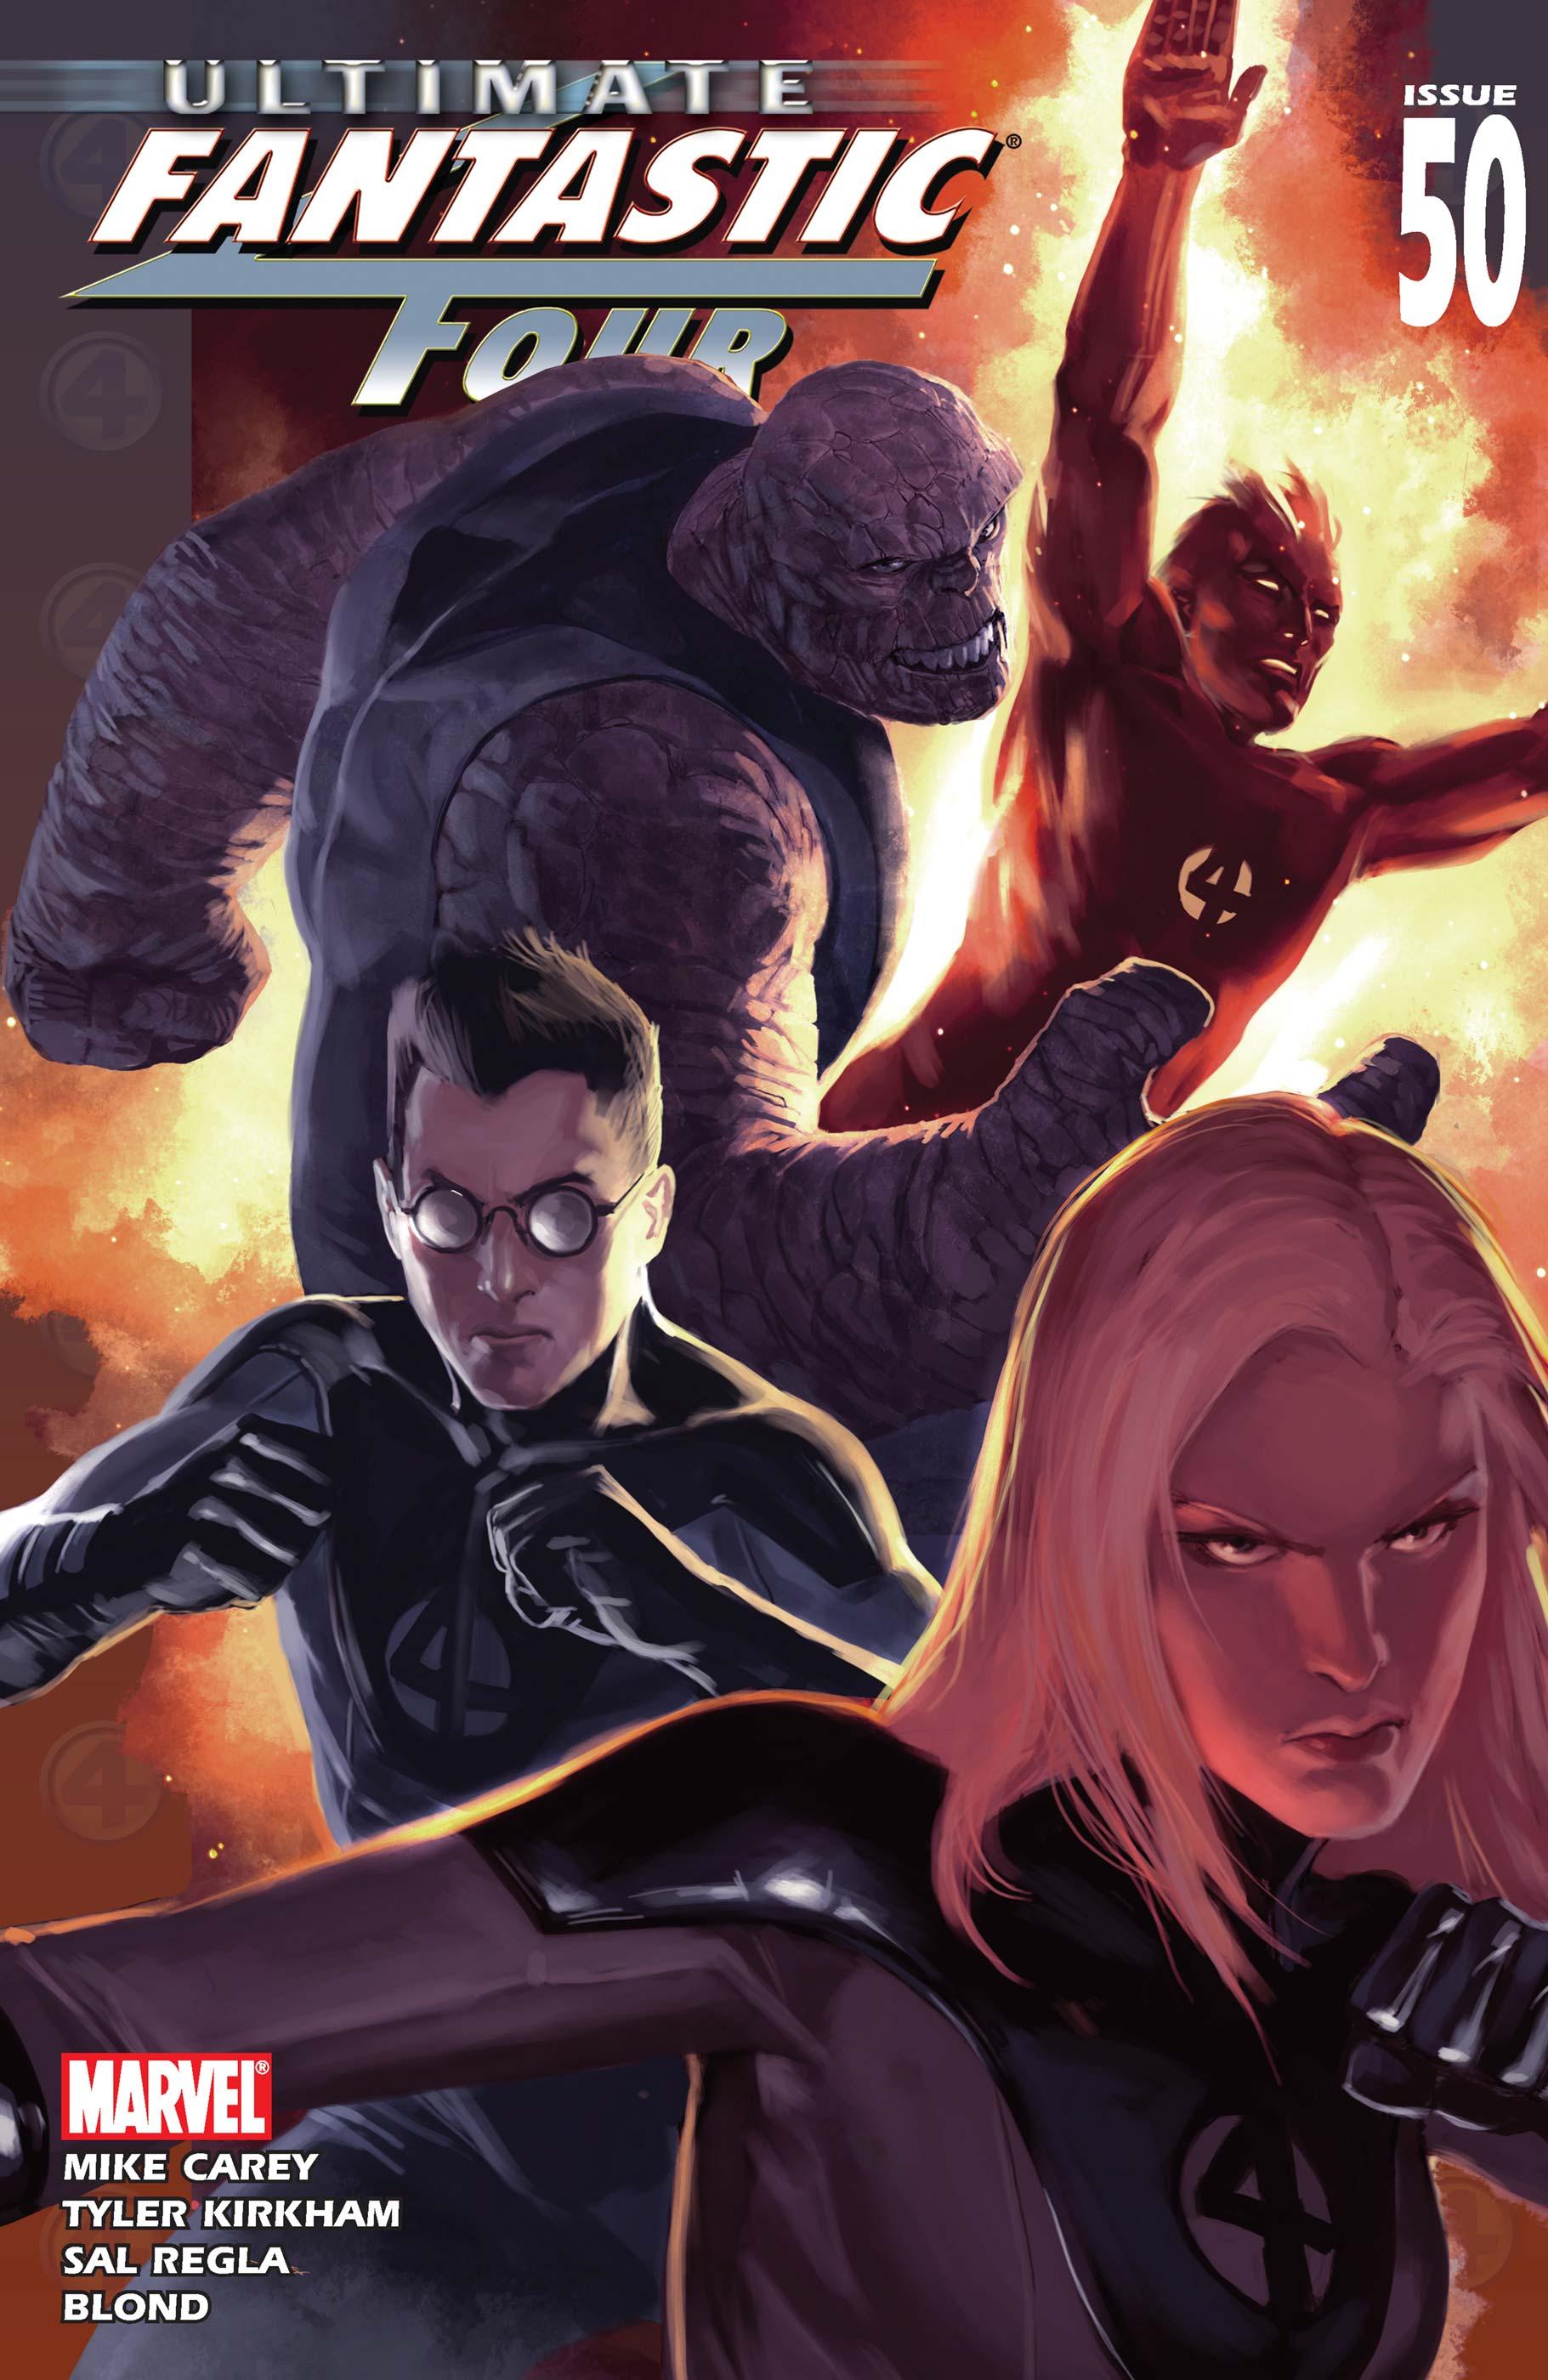 Ultimate Fantastic Four (2003) #50